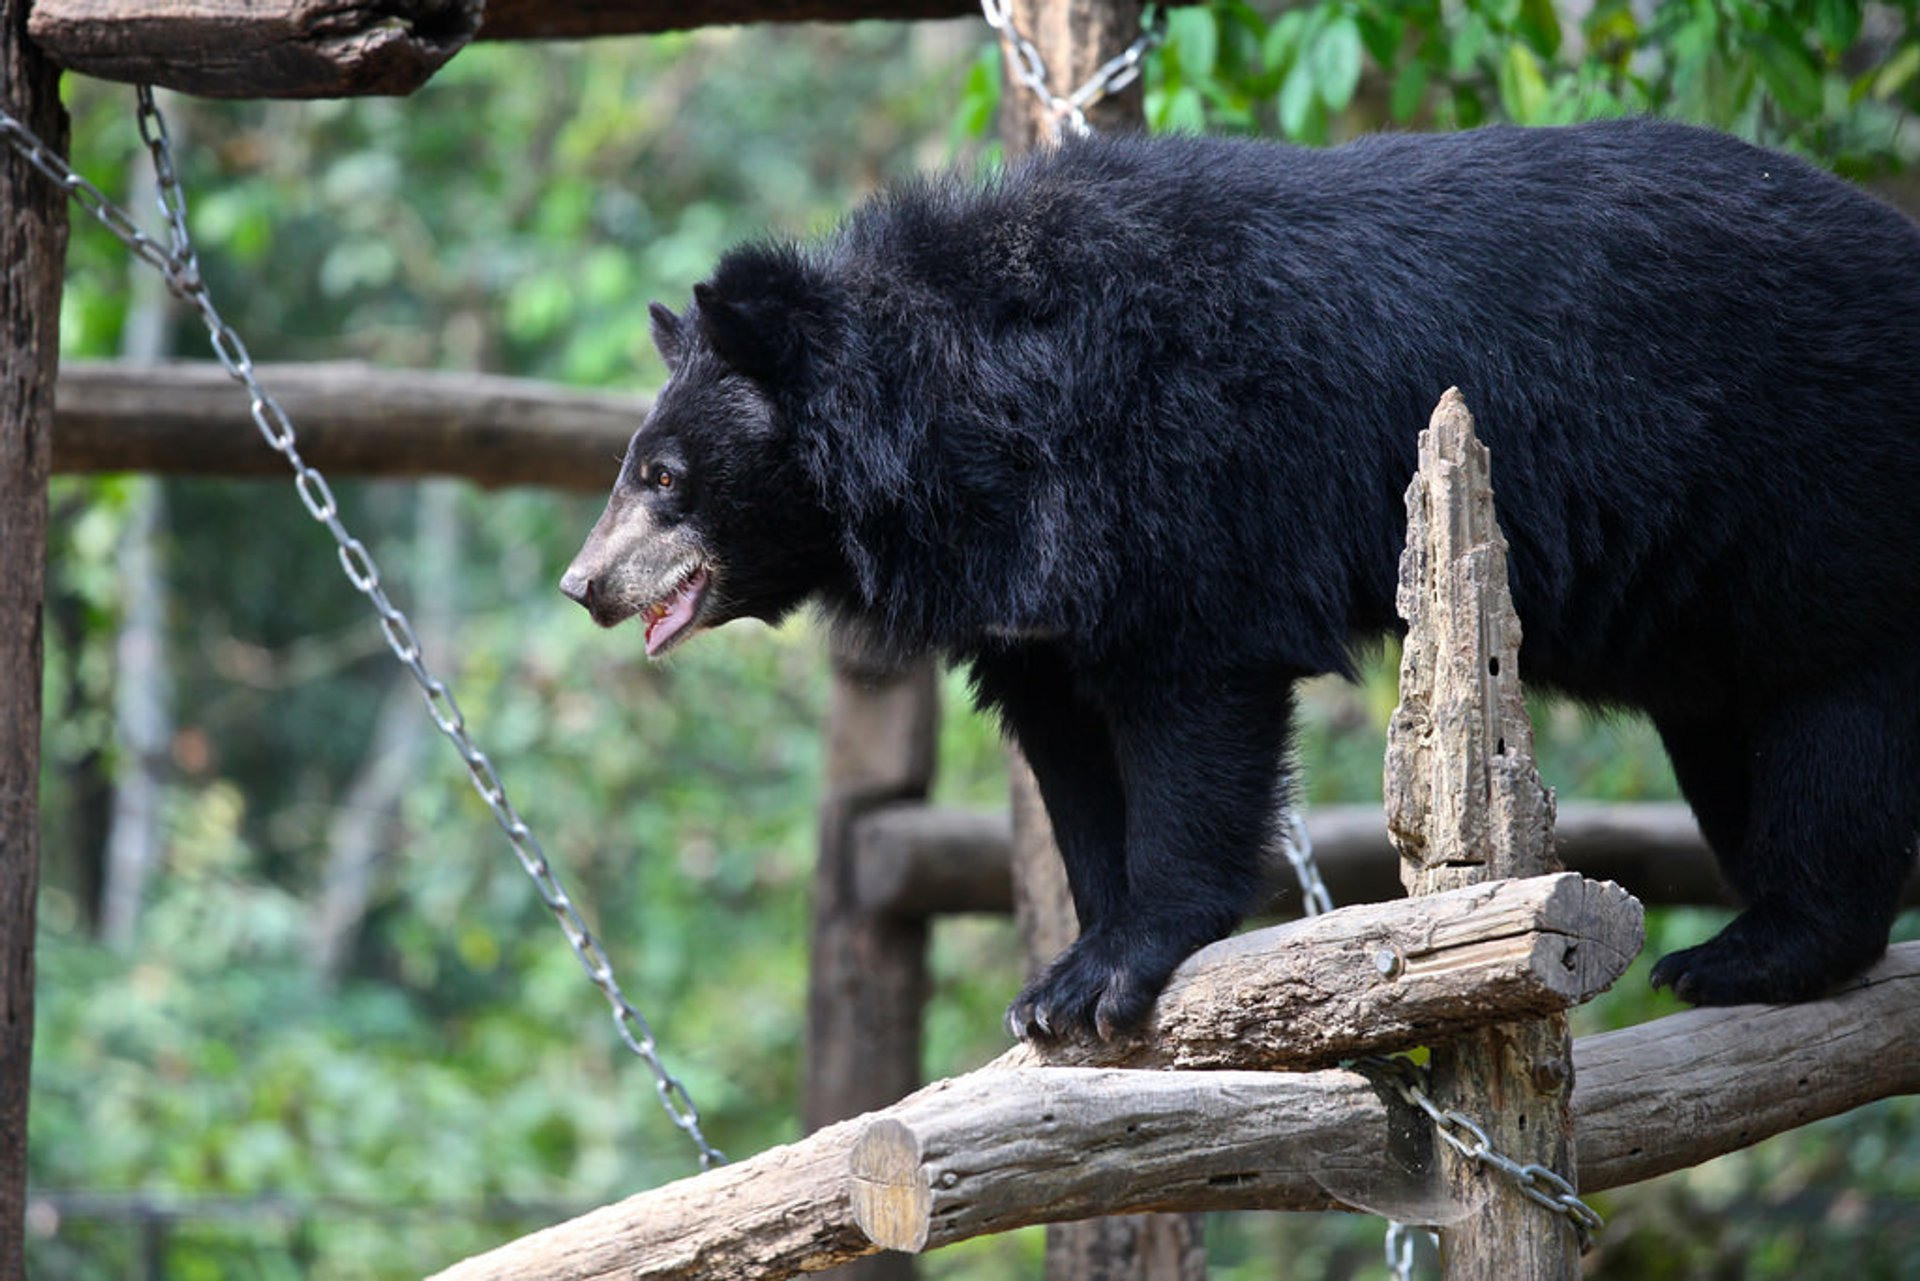 Asian Black Bear in Laos 2020 - Best Time